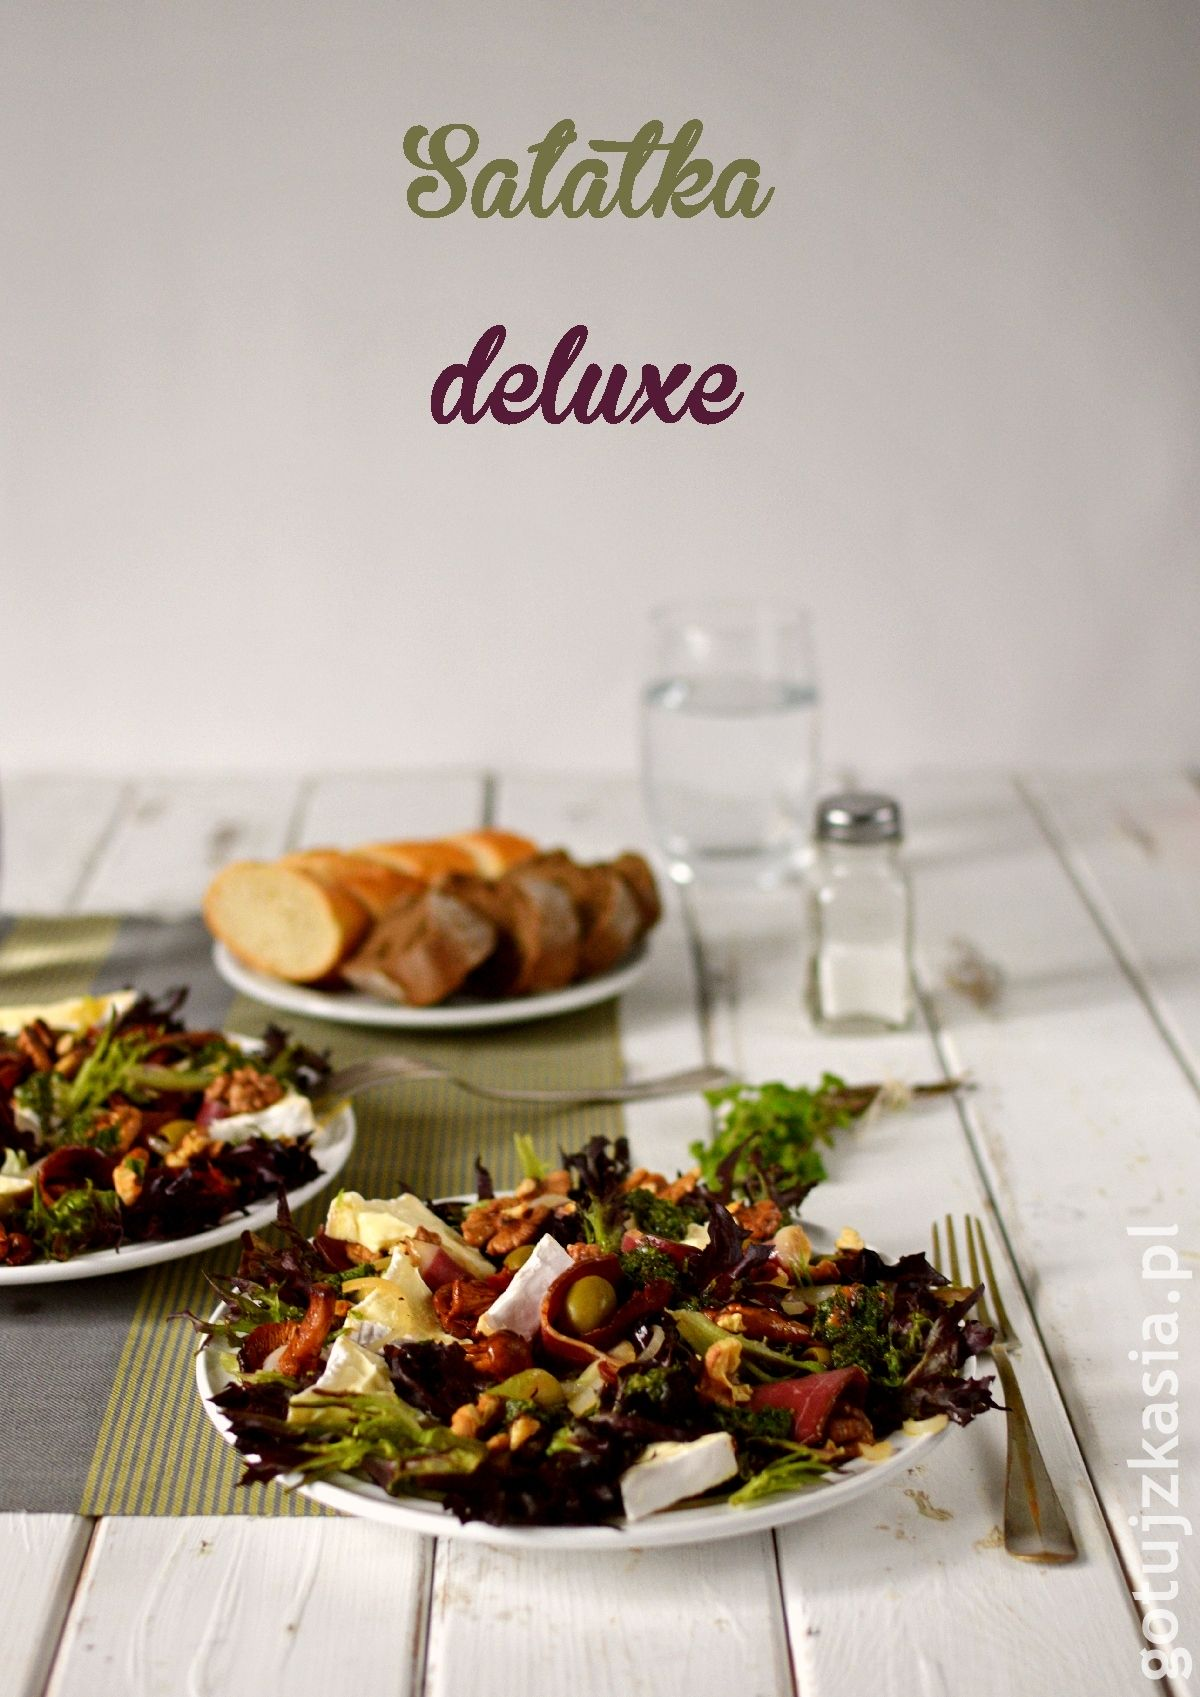 salatka deluxe 1